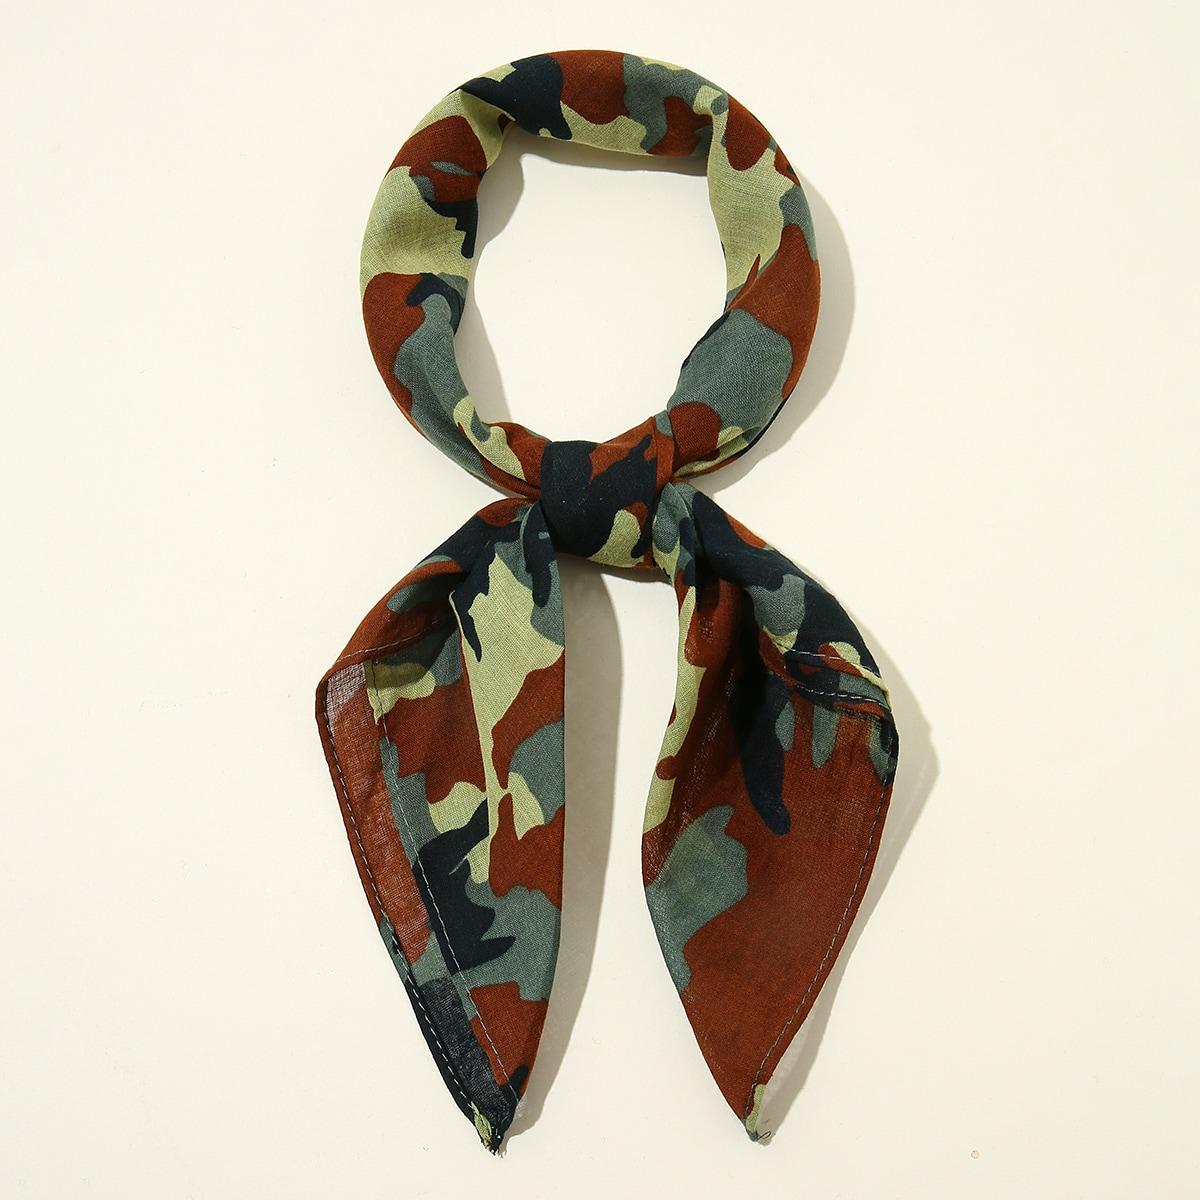 shein Bandana met camouflagepatroon